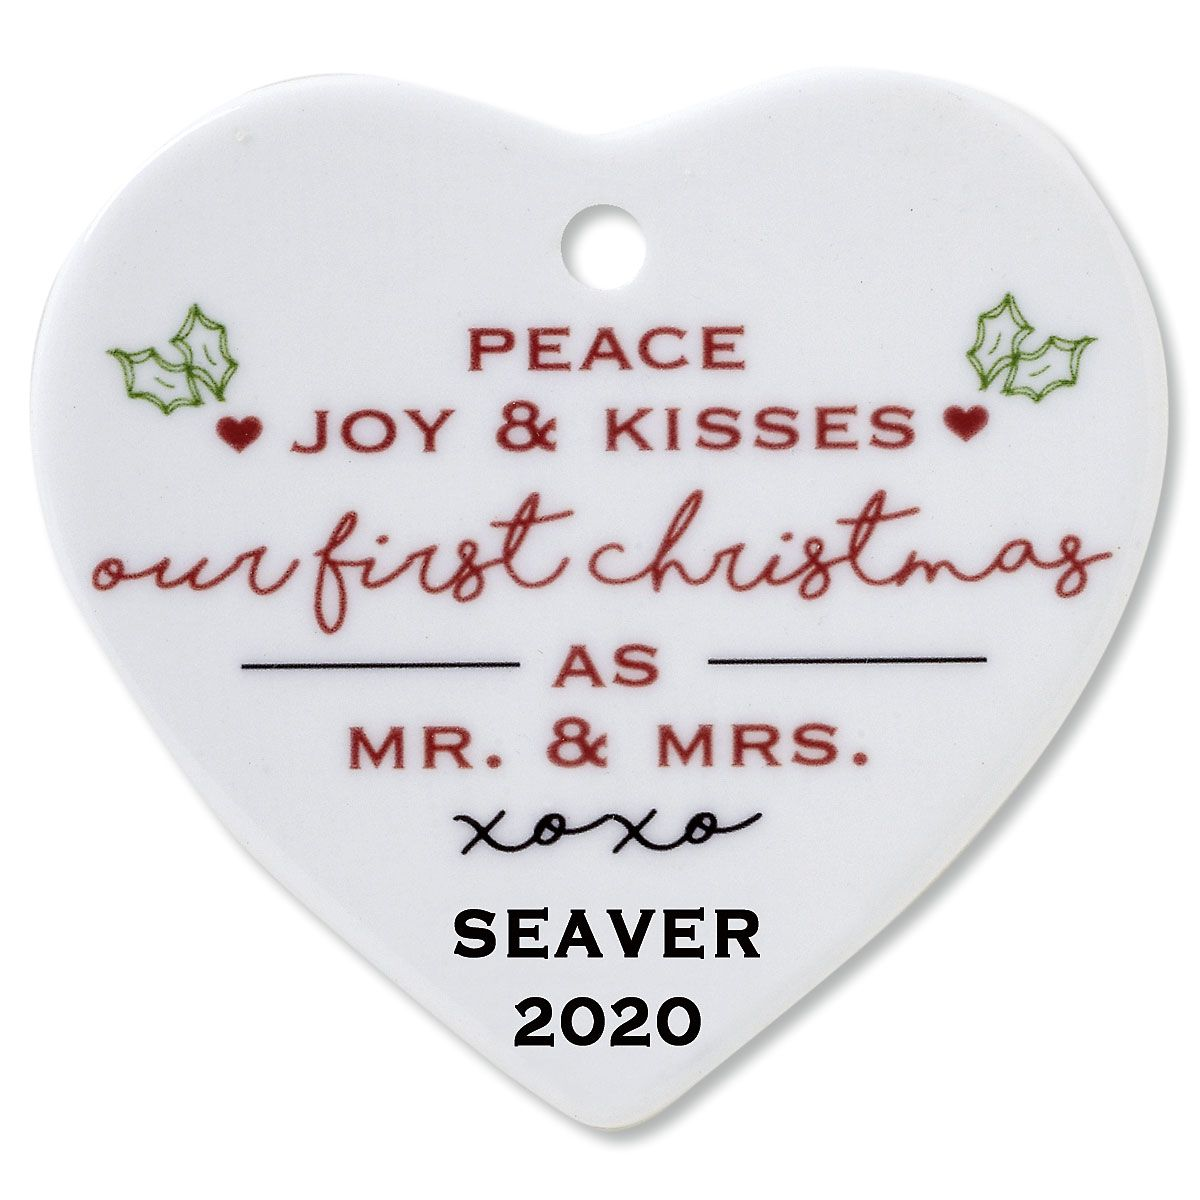 Peace, Joy & Kisses Heart Wedding Ceramic Personalized Christmas Ornament